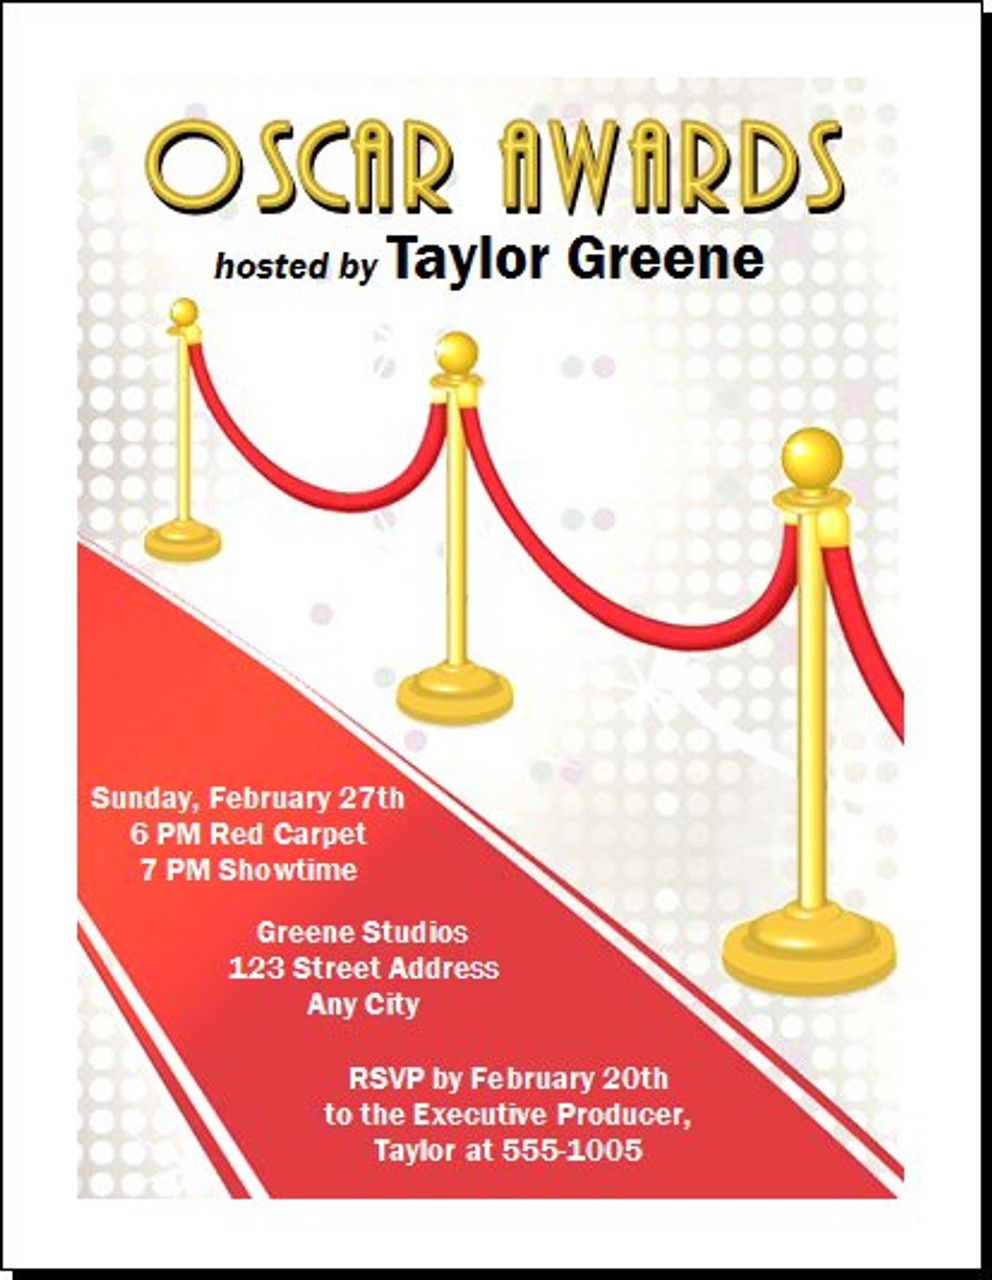 red carpet oscar awards party invitation